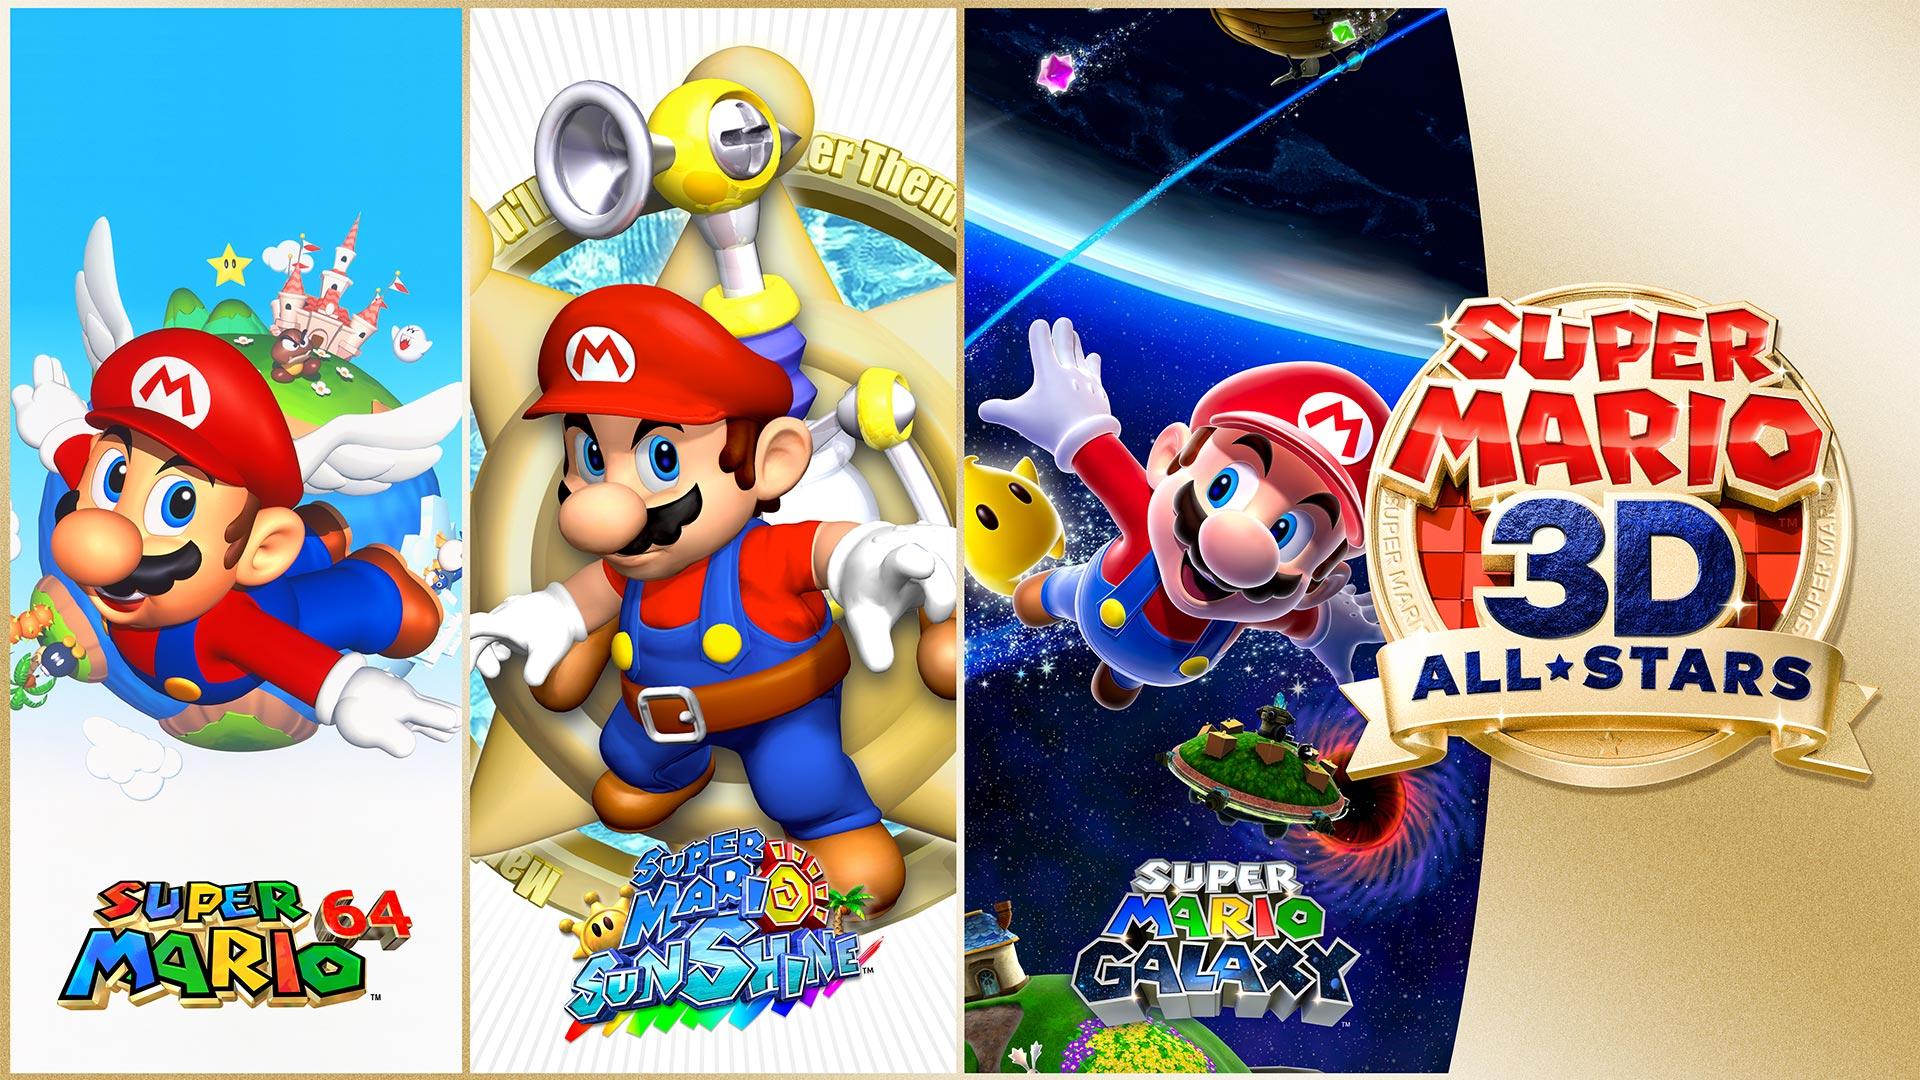 Nintendo - Super Mario 3D All-Stars